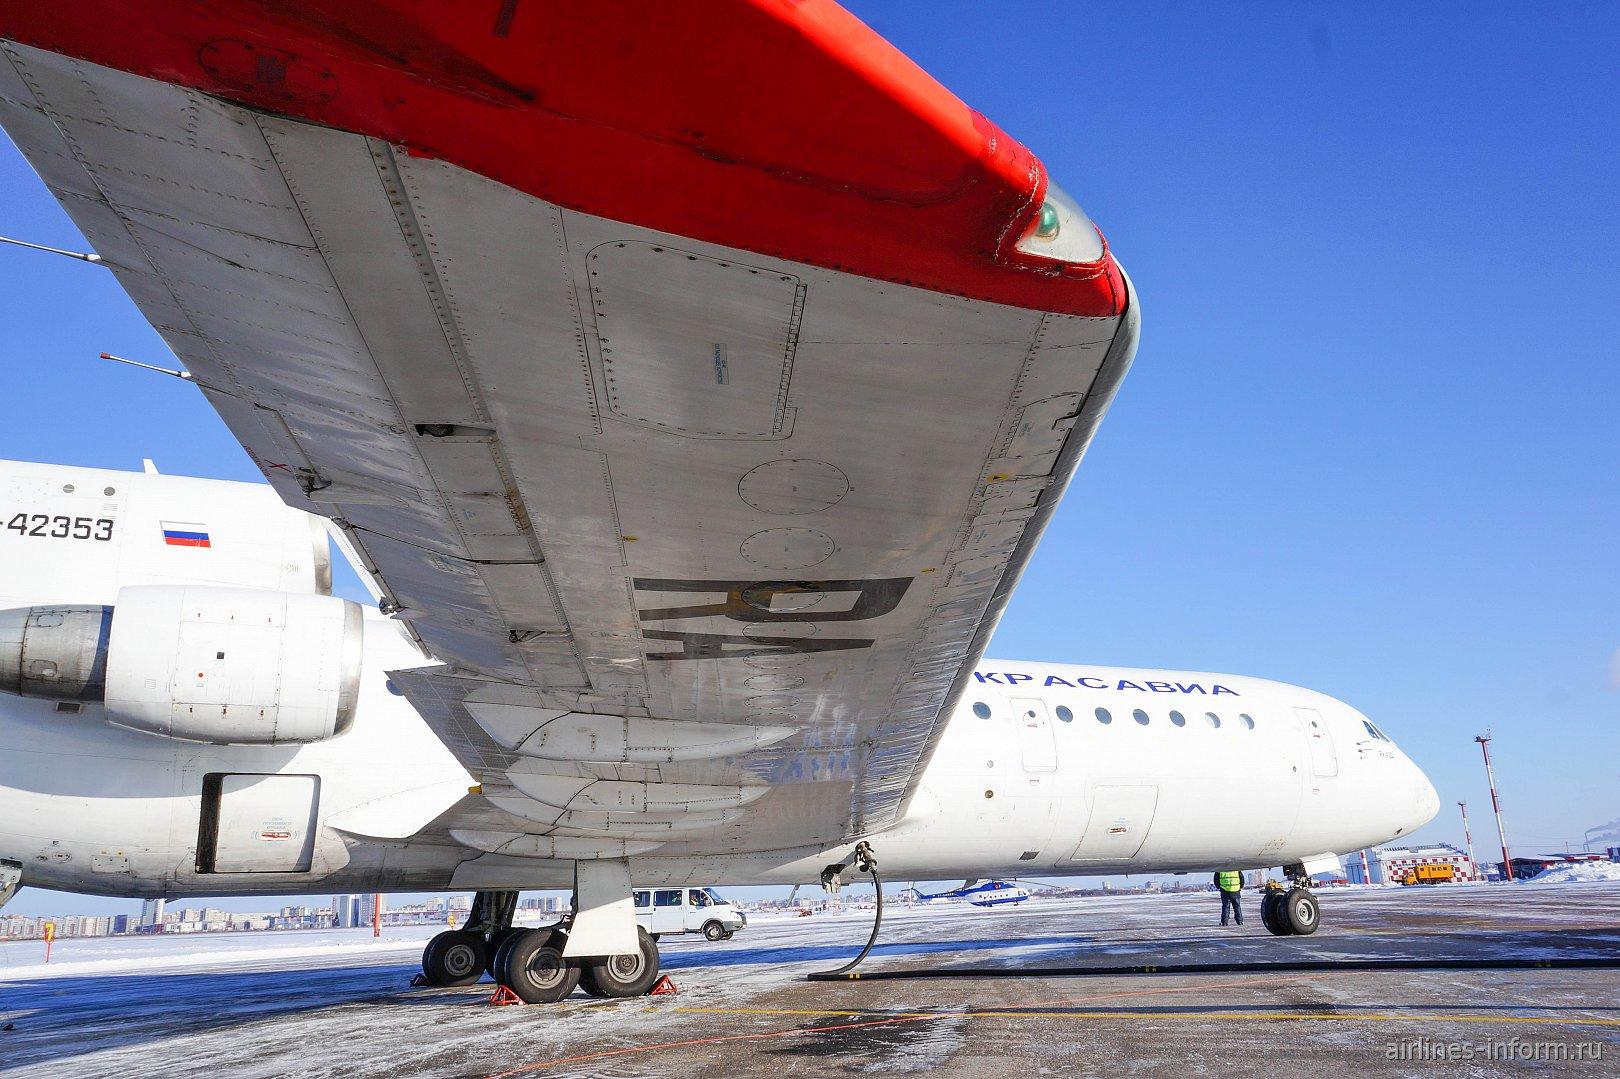 Омск-Уфа, авиакомпания Красавиа, ЯК-42Д, RA-42353